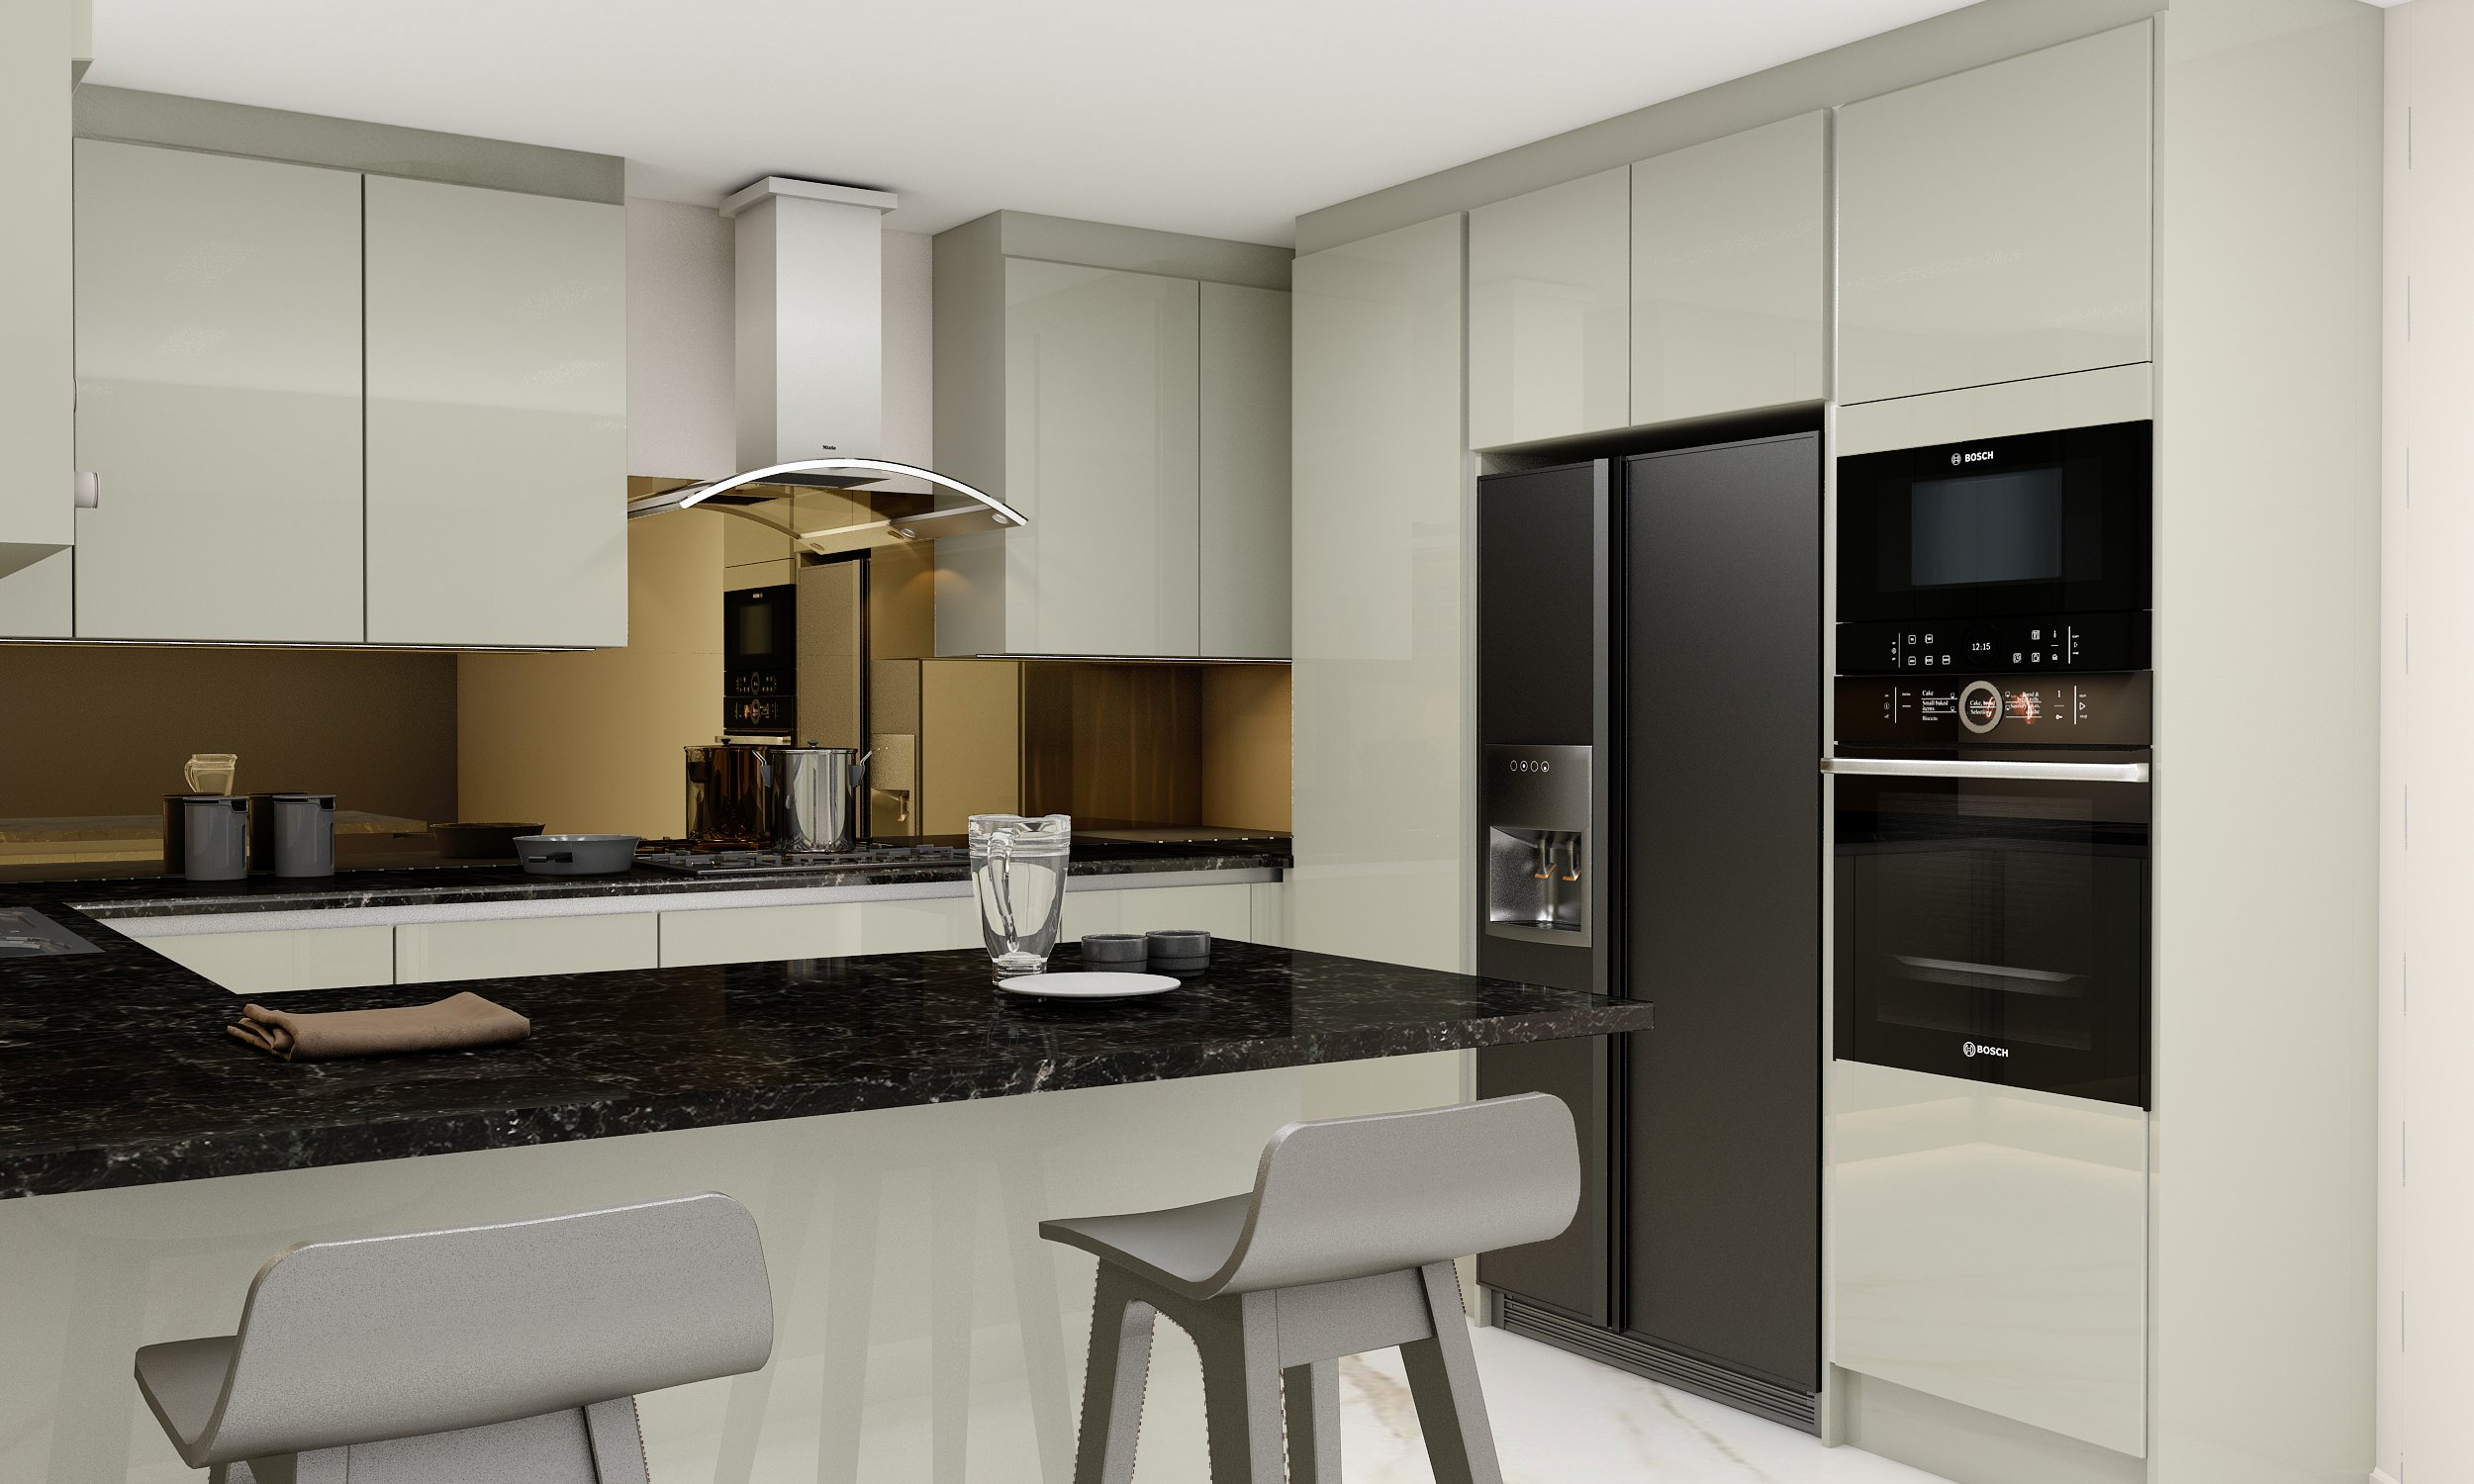 Handleless G Shape Kitchen in Silver Handle Profile With High Gloss khaki Grey Finish Wine Rack